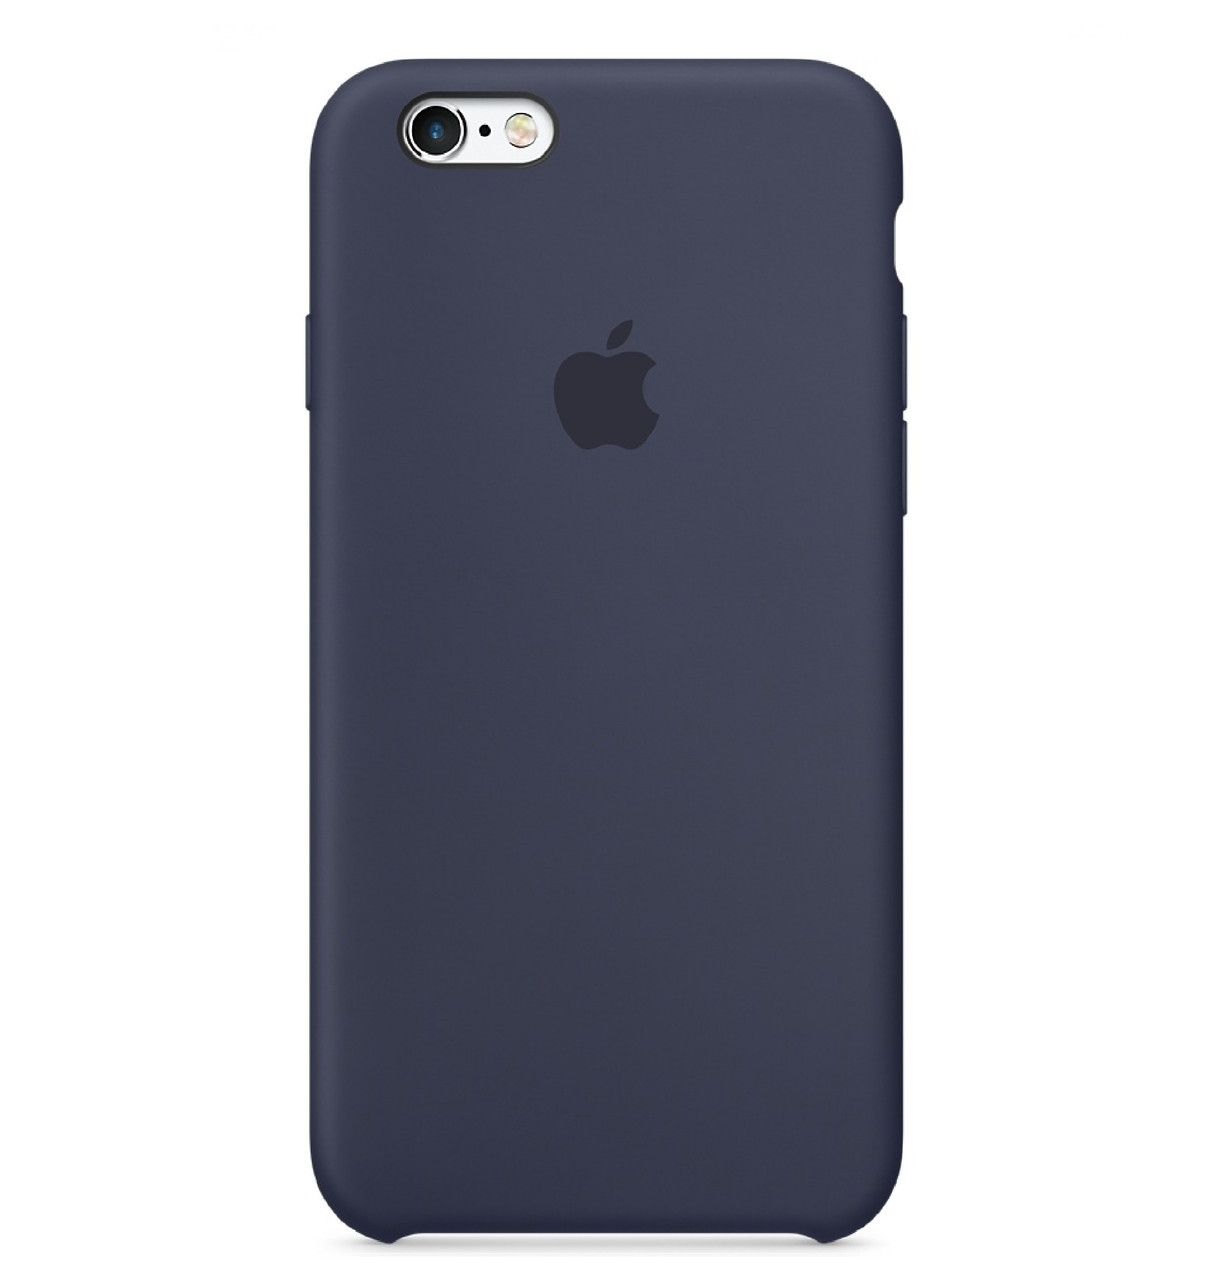 Чехол накладка Apple Silicon Case для IPhone 6/6s Dark Blue